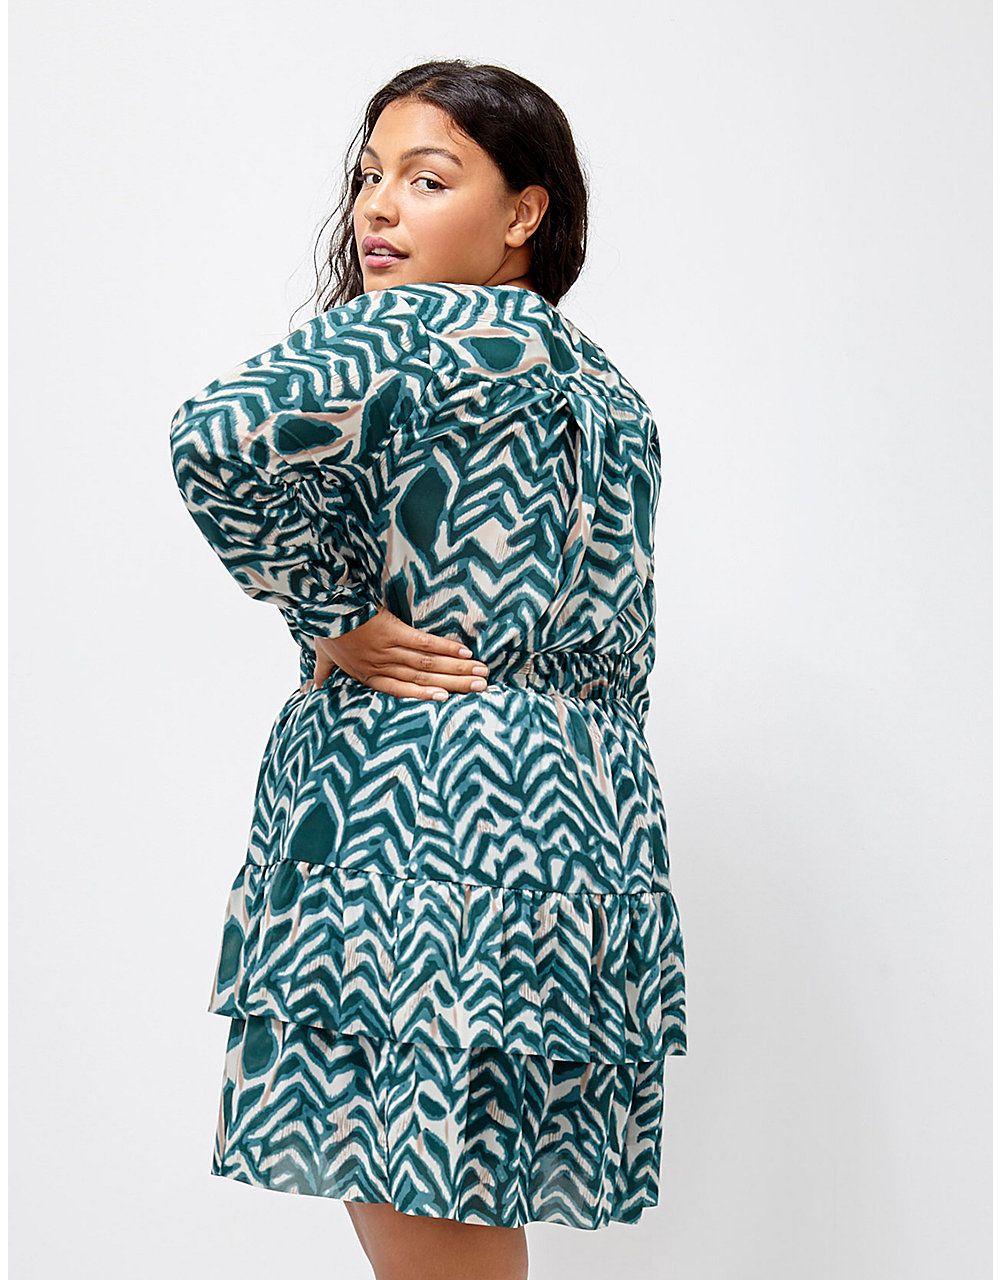 6th & Lane Zebra-Print Tiered Skirt | Lane Bryant | Lane Bryant ...